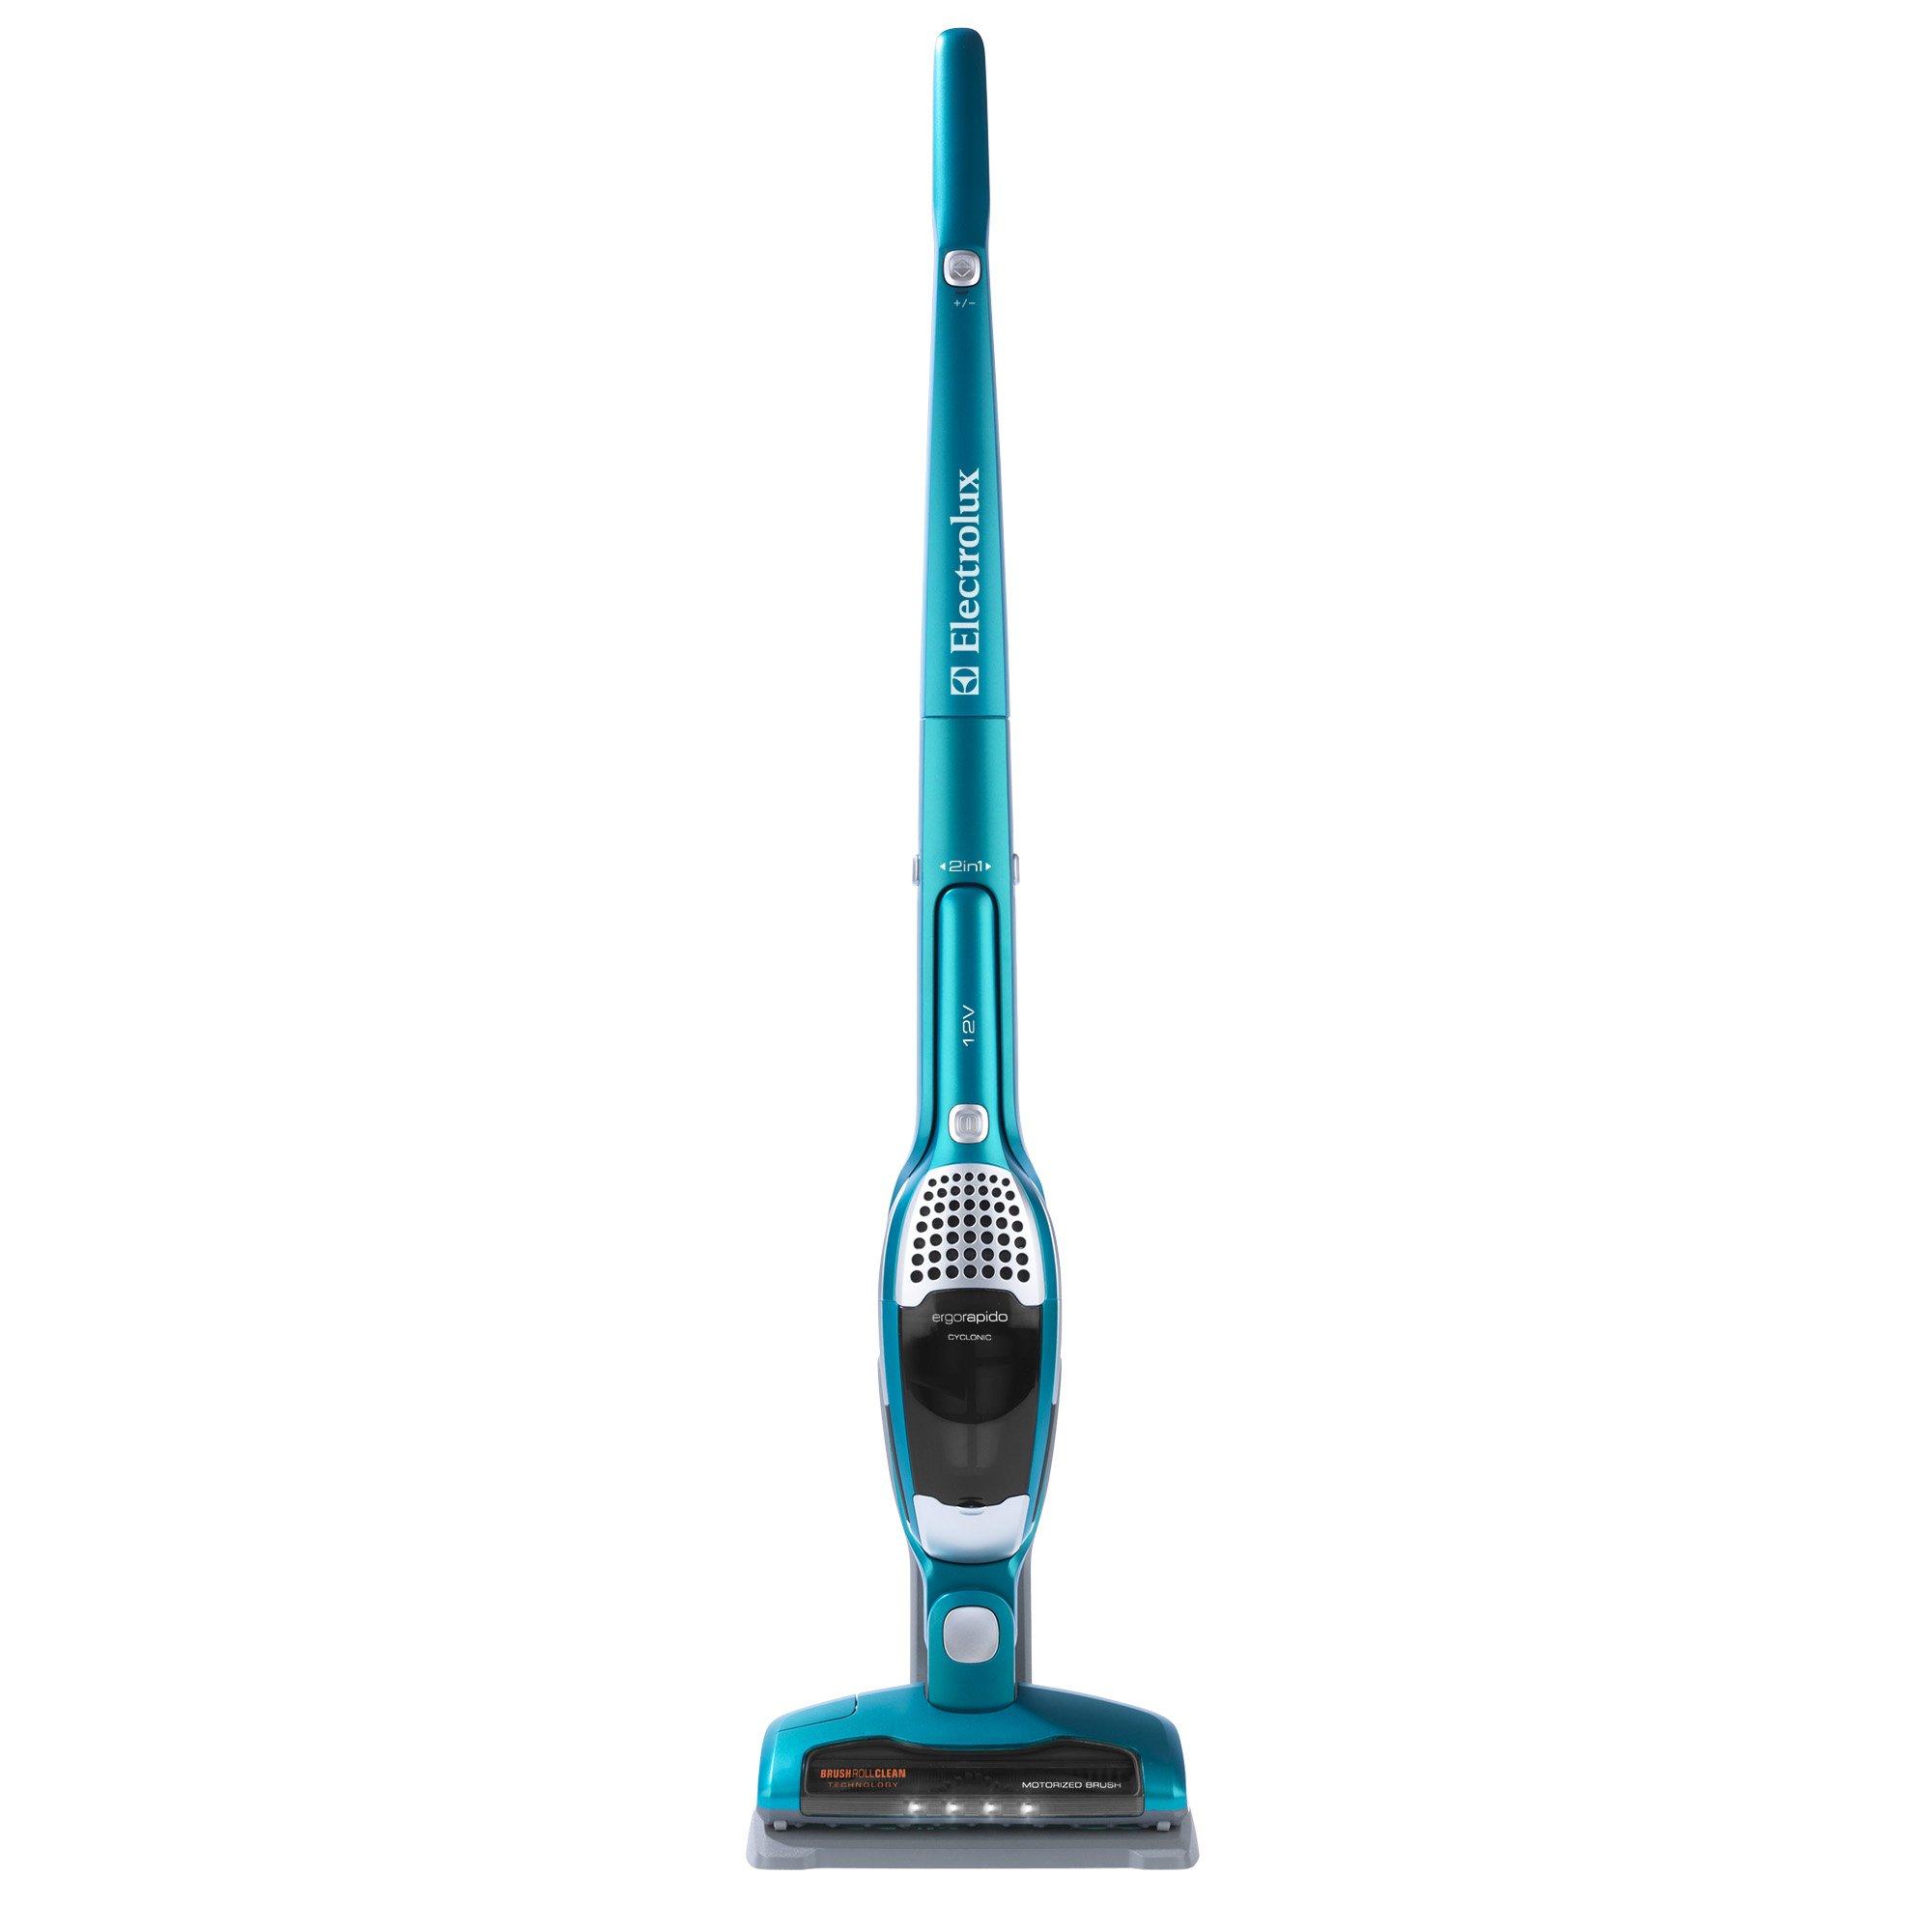 Electrolux Ergorapido Brushroll Clean 2-in-1 Cordless Stick Vacuum, EL1064A